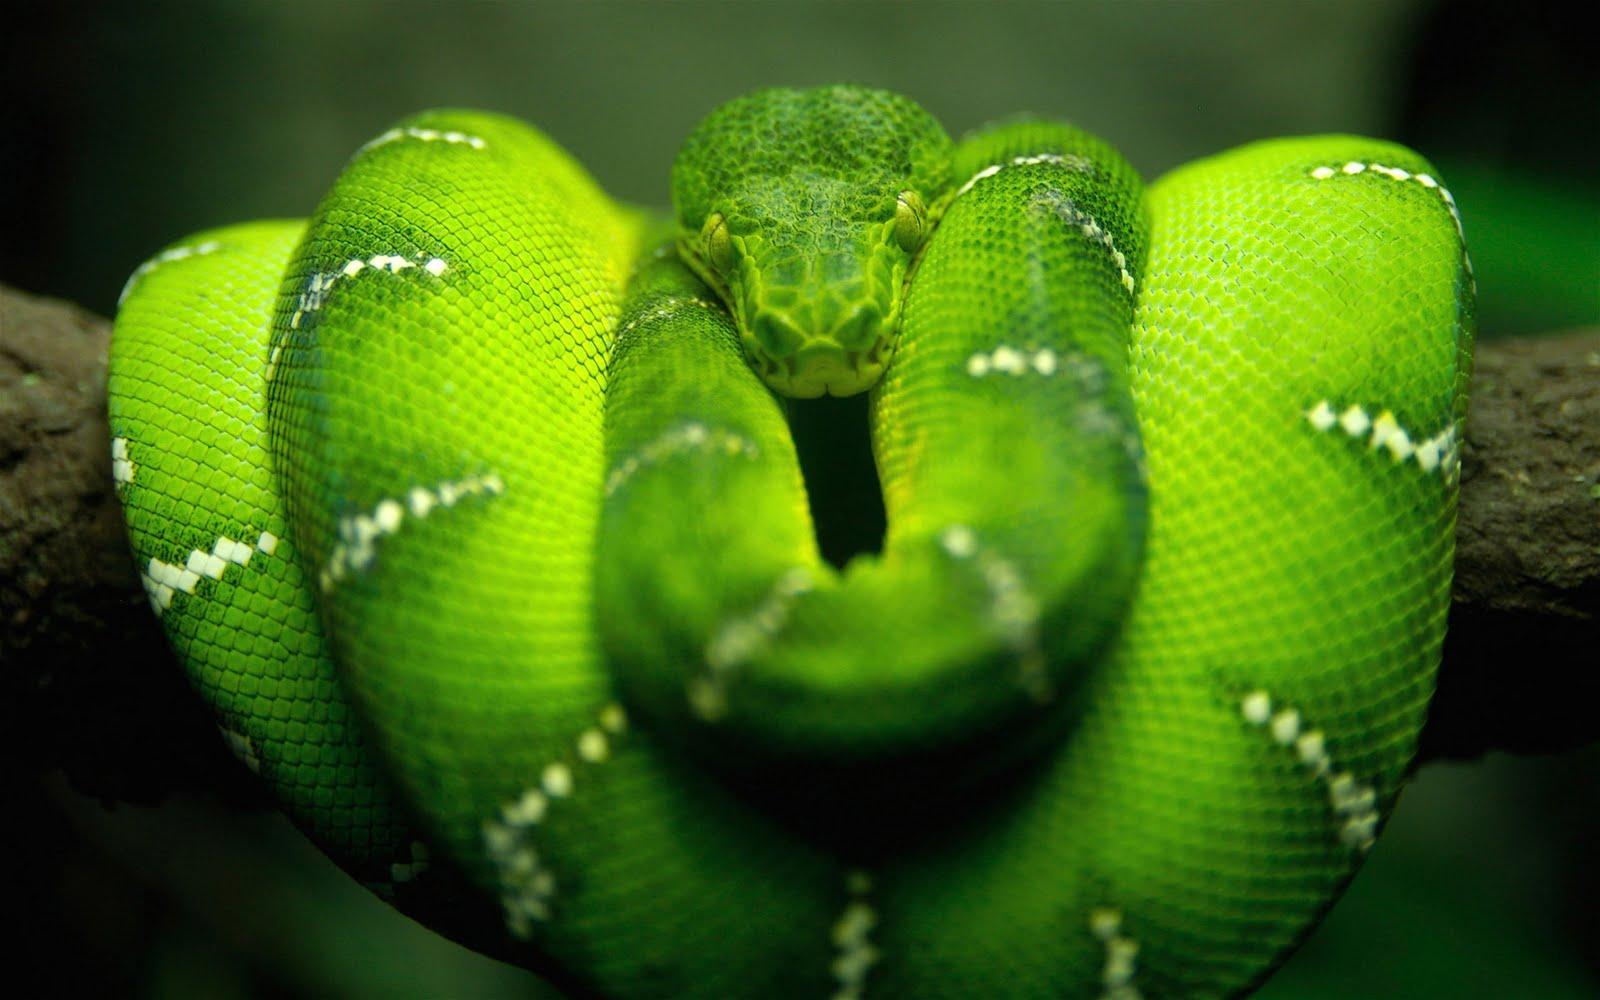 http://1.bp.blogspot.com/-721qT4iXYsA/TeDqFmd4clI/AAAAAAAAAfk/VUAzFDnQUpU/s1600/green-snake-hd-wallpaper-1920x1200.jpeg